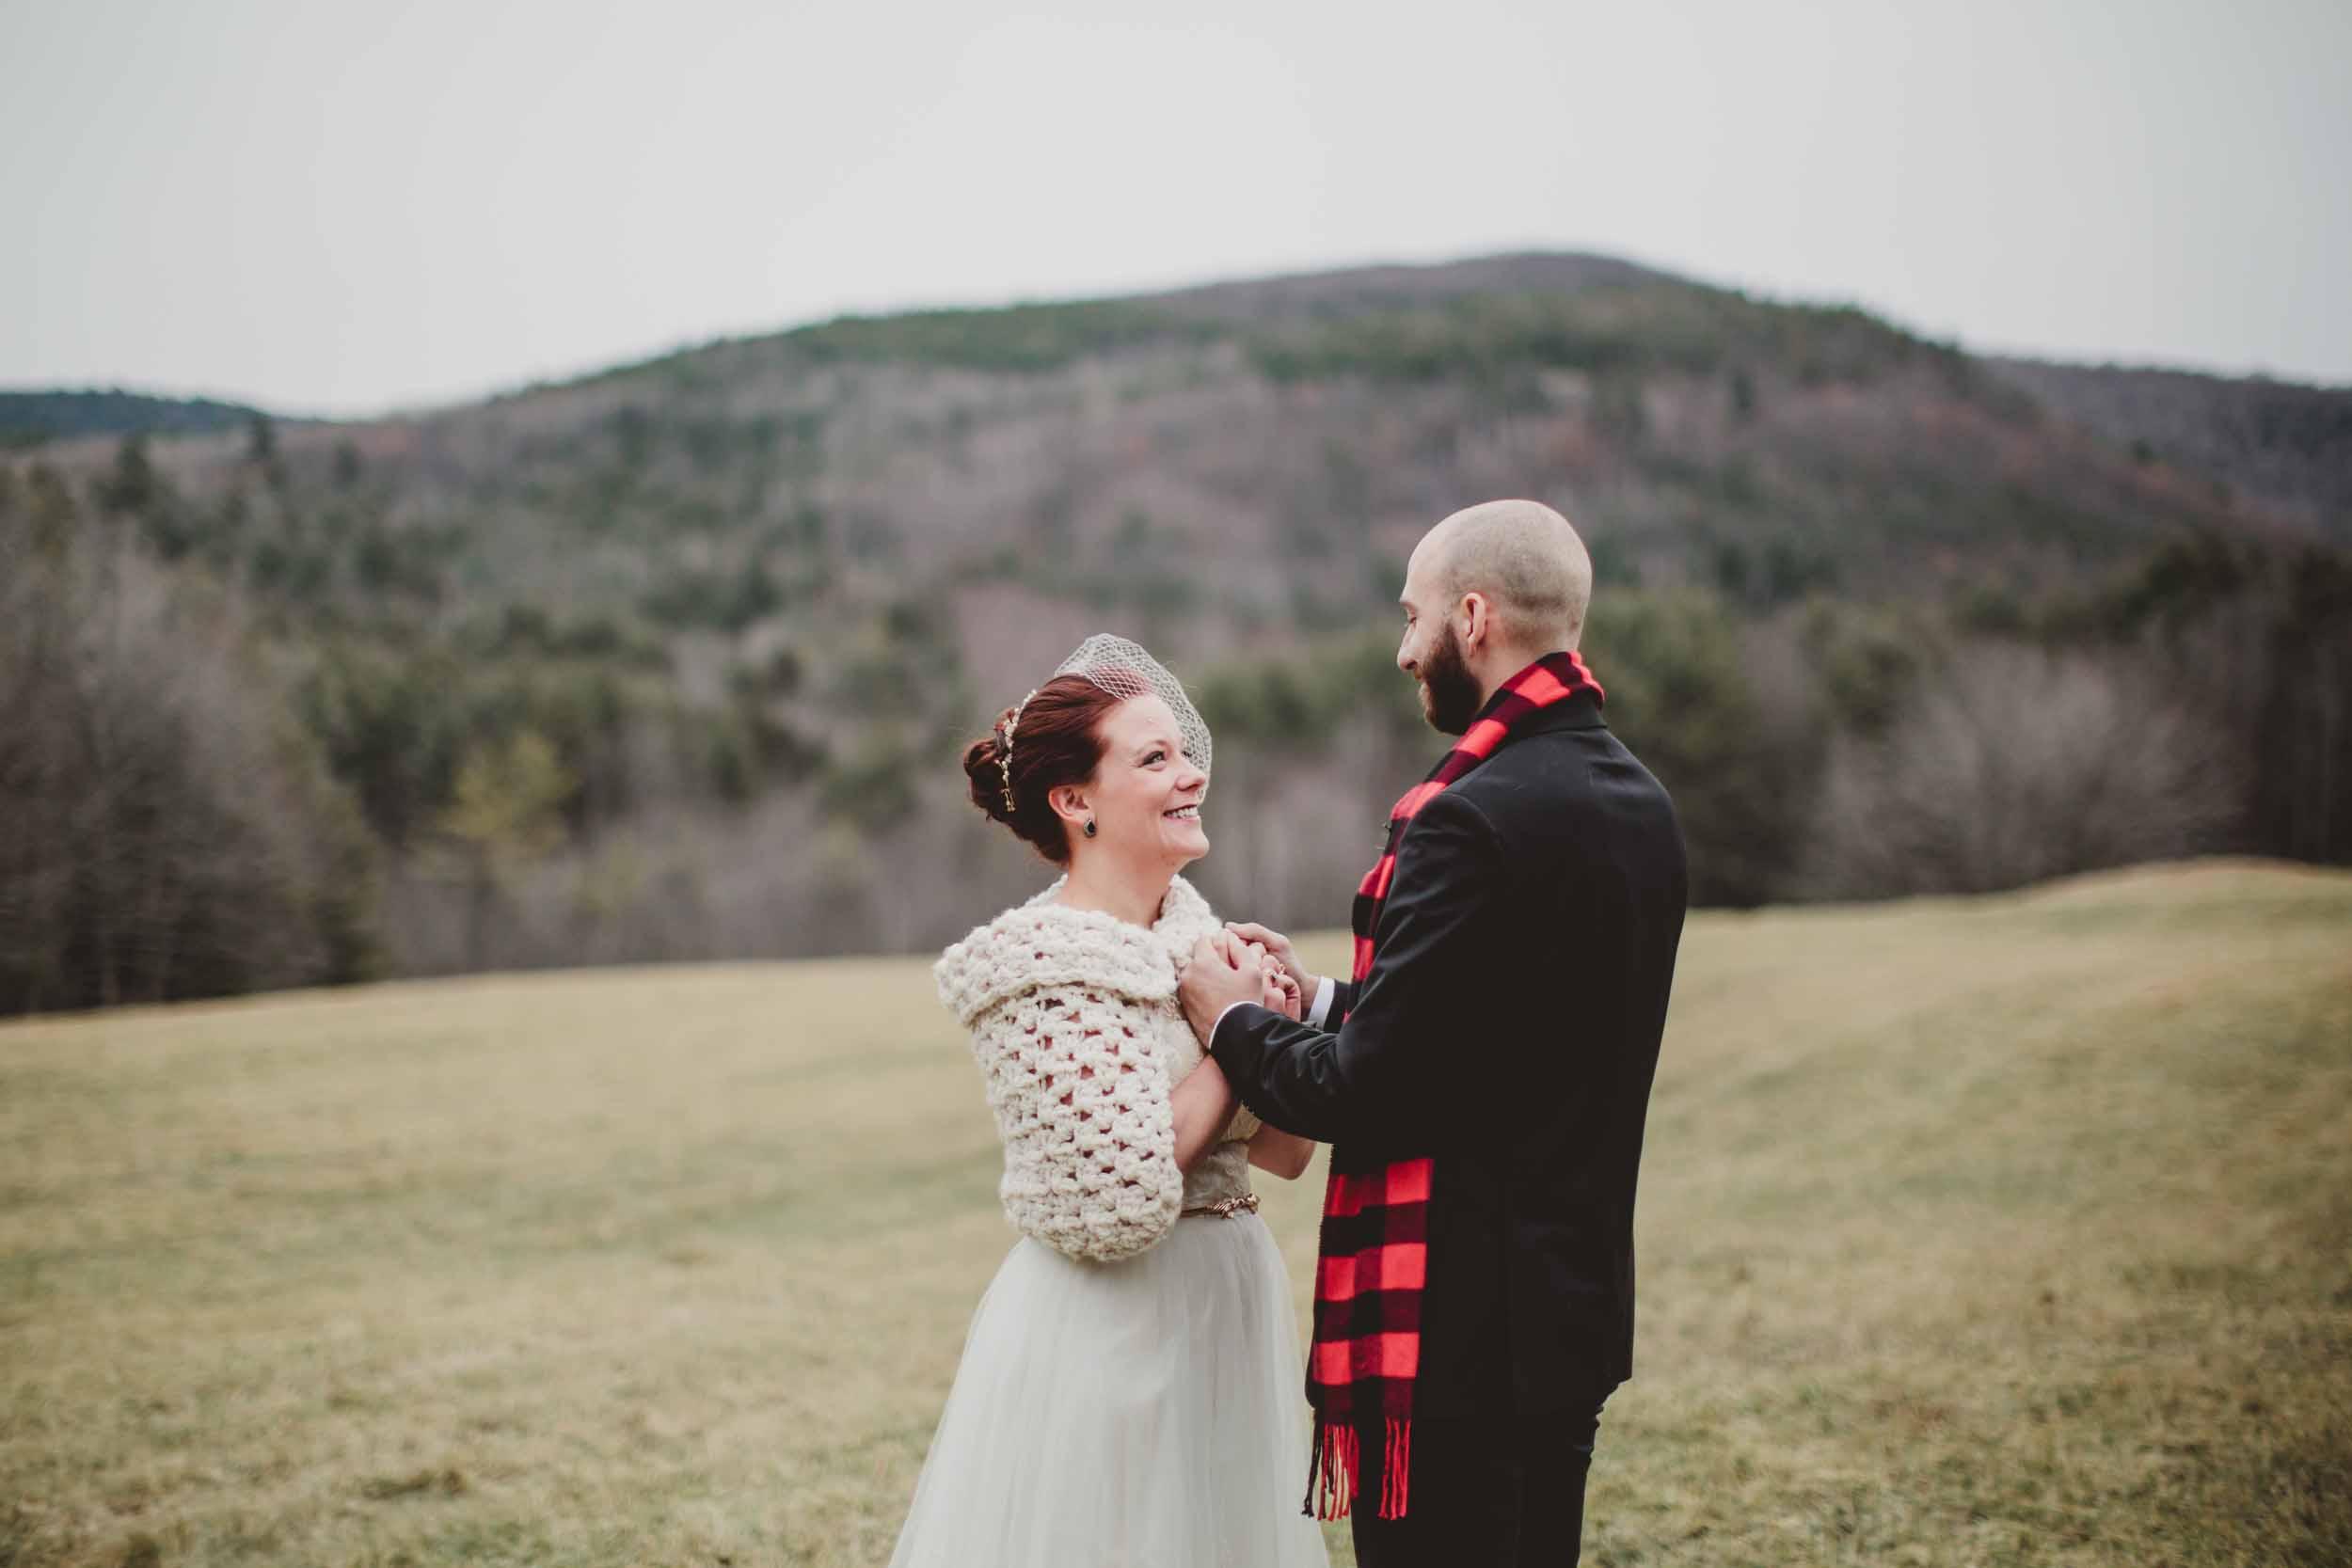 Stone-mountain-arts-wedding100.jpg